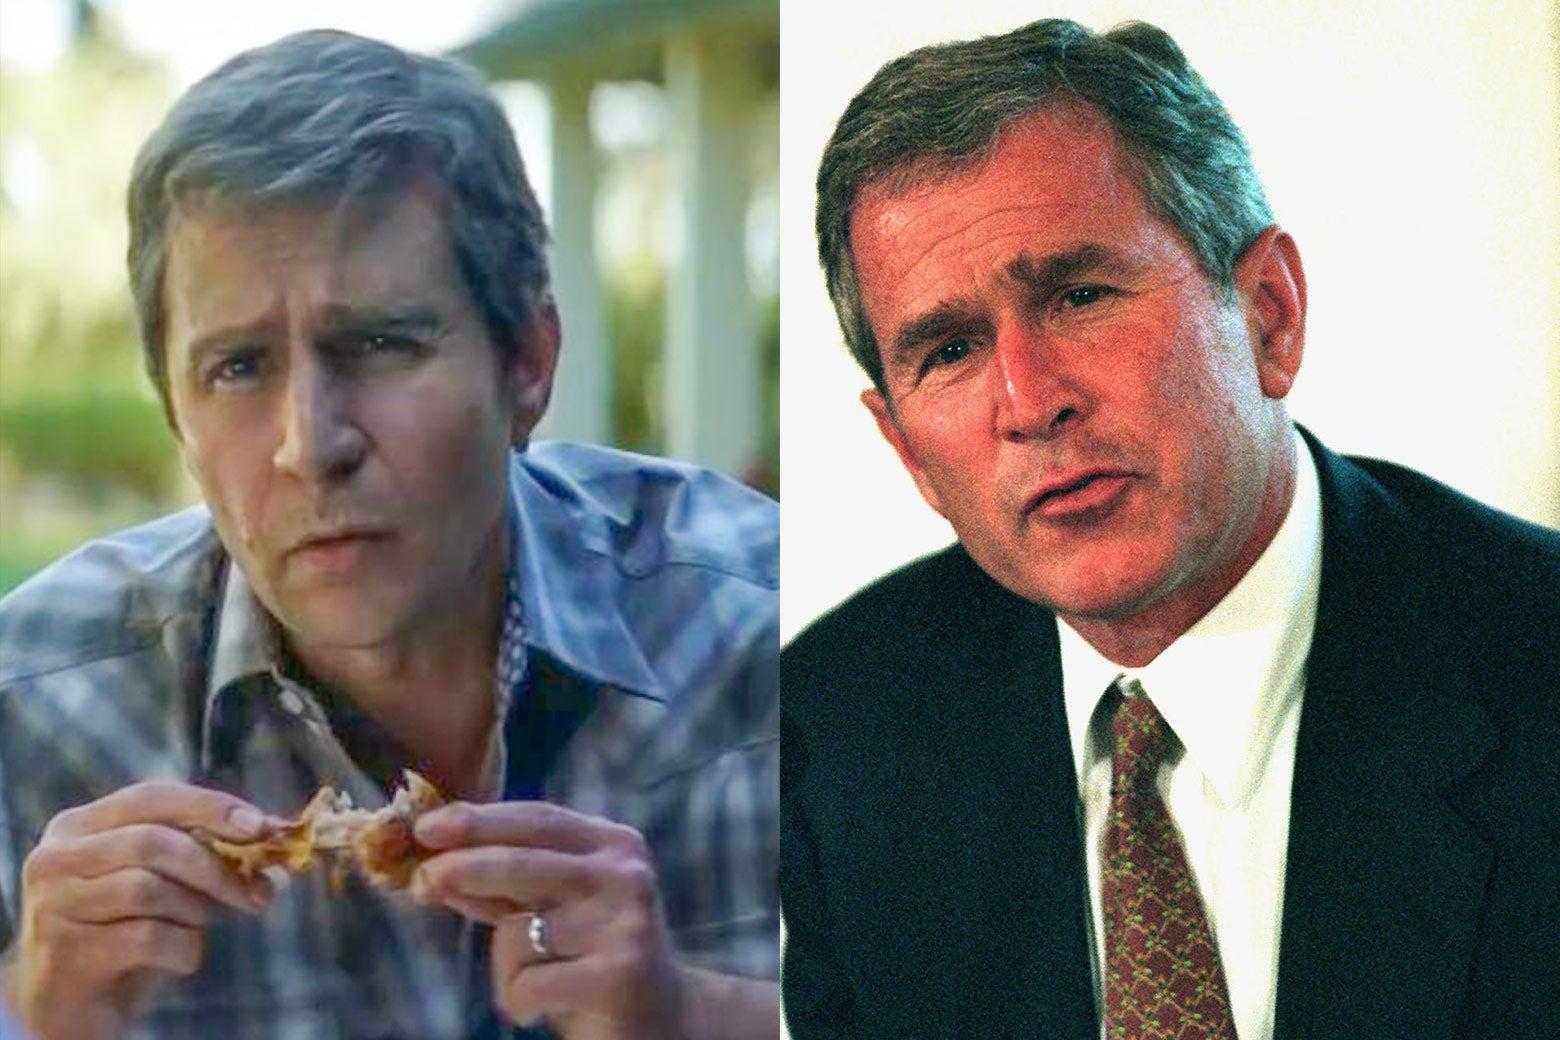 Side-by-side of Sam Rockwell and former U.S. President George W. Bush